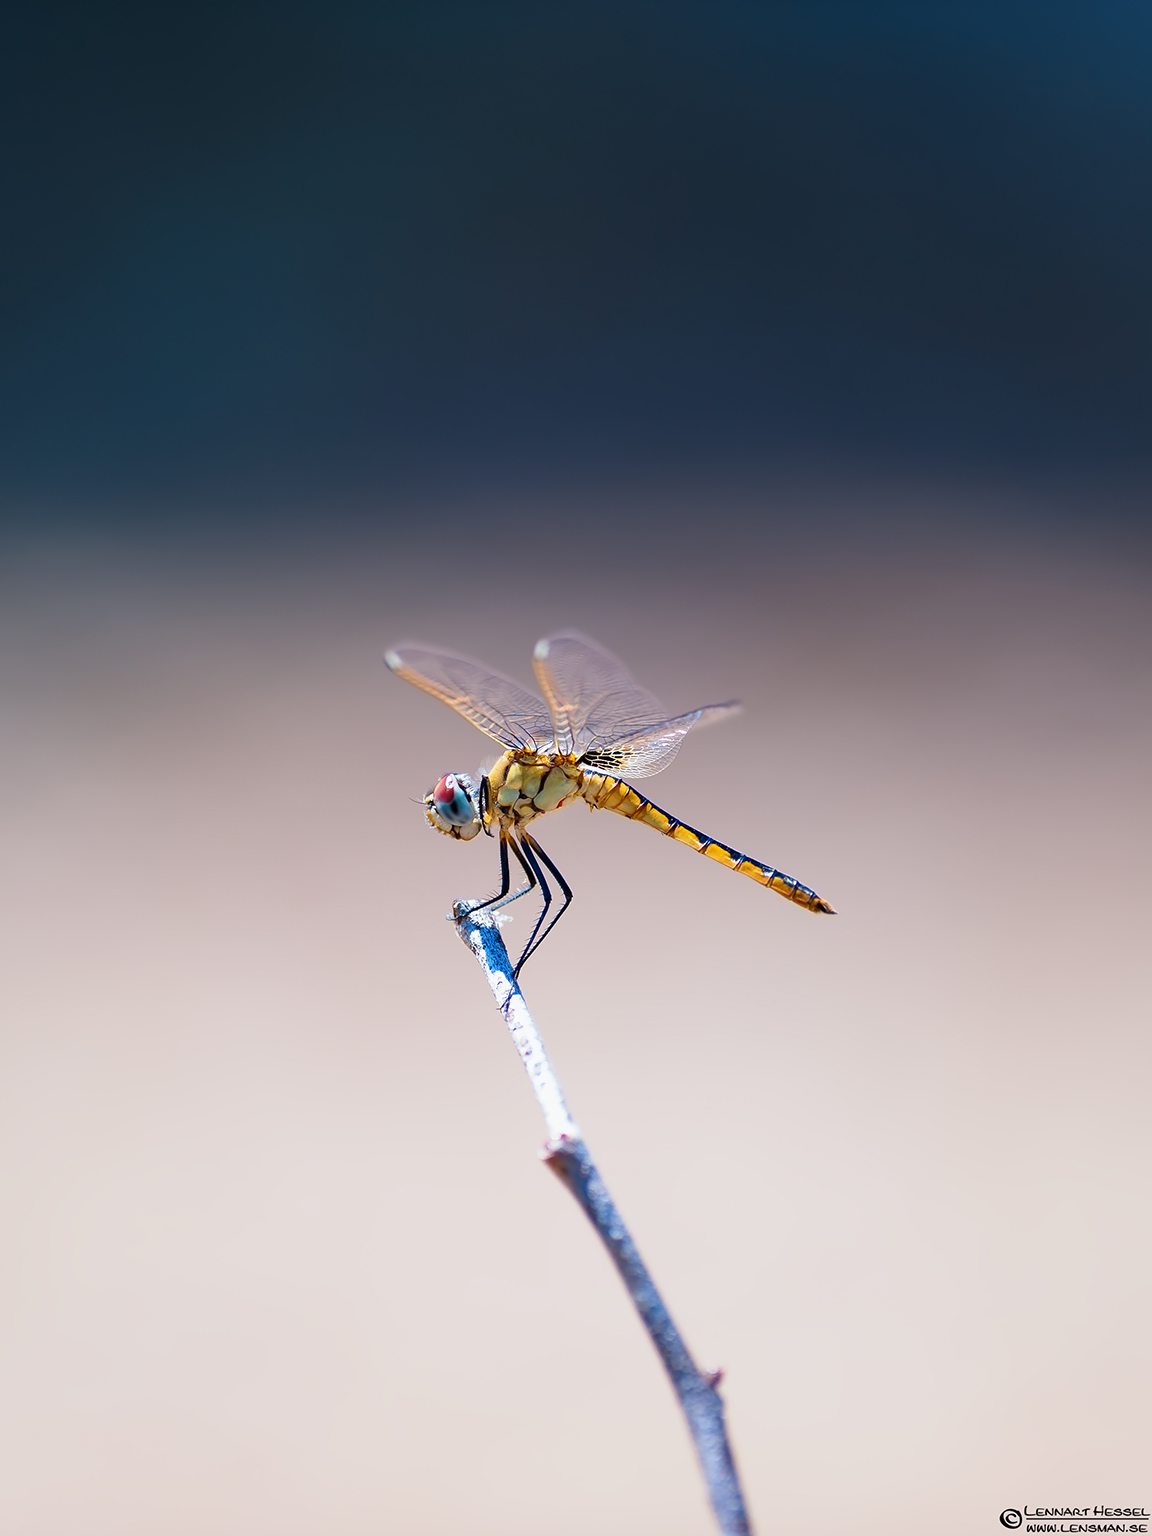 Dragonfly Moremi Game Reserve, Botswana